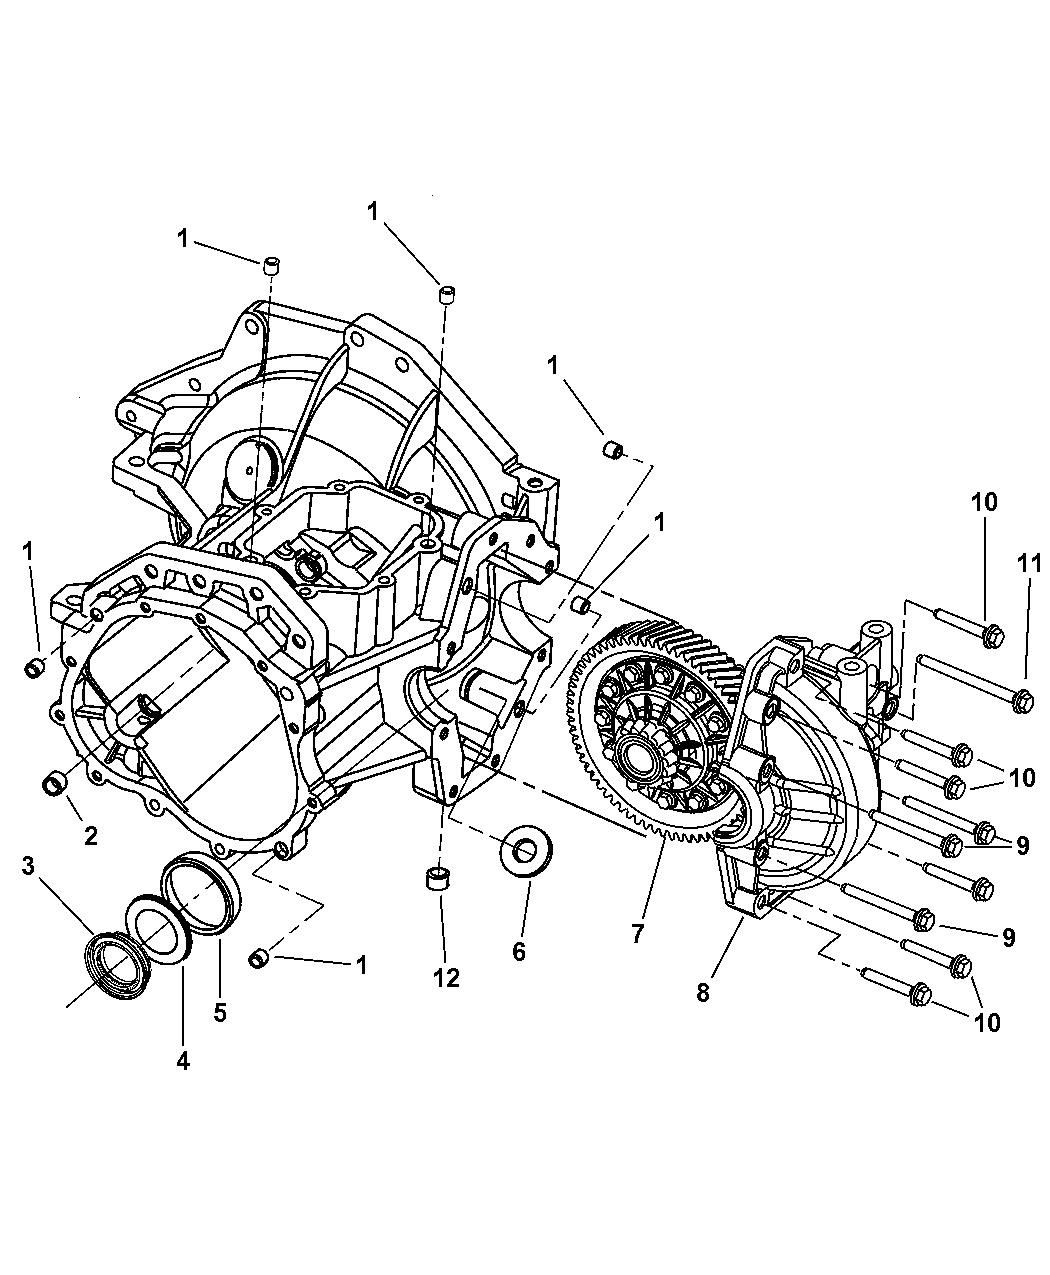 2004 chrysler sebring sedan convertible case transaxle differential publicscrutiny Images